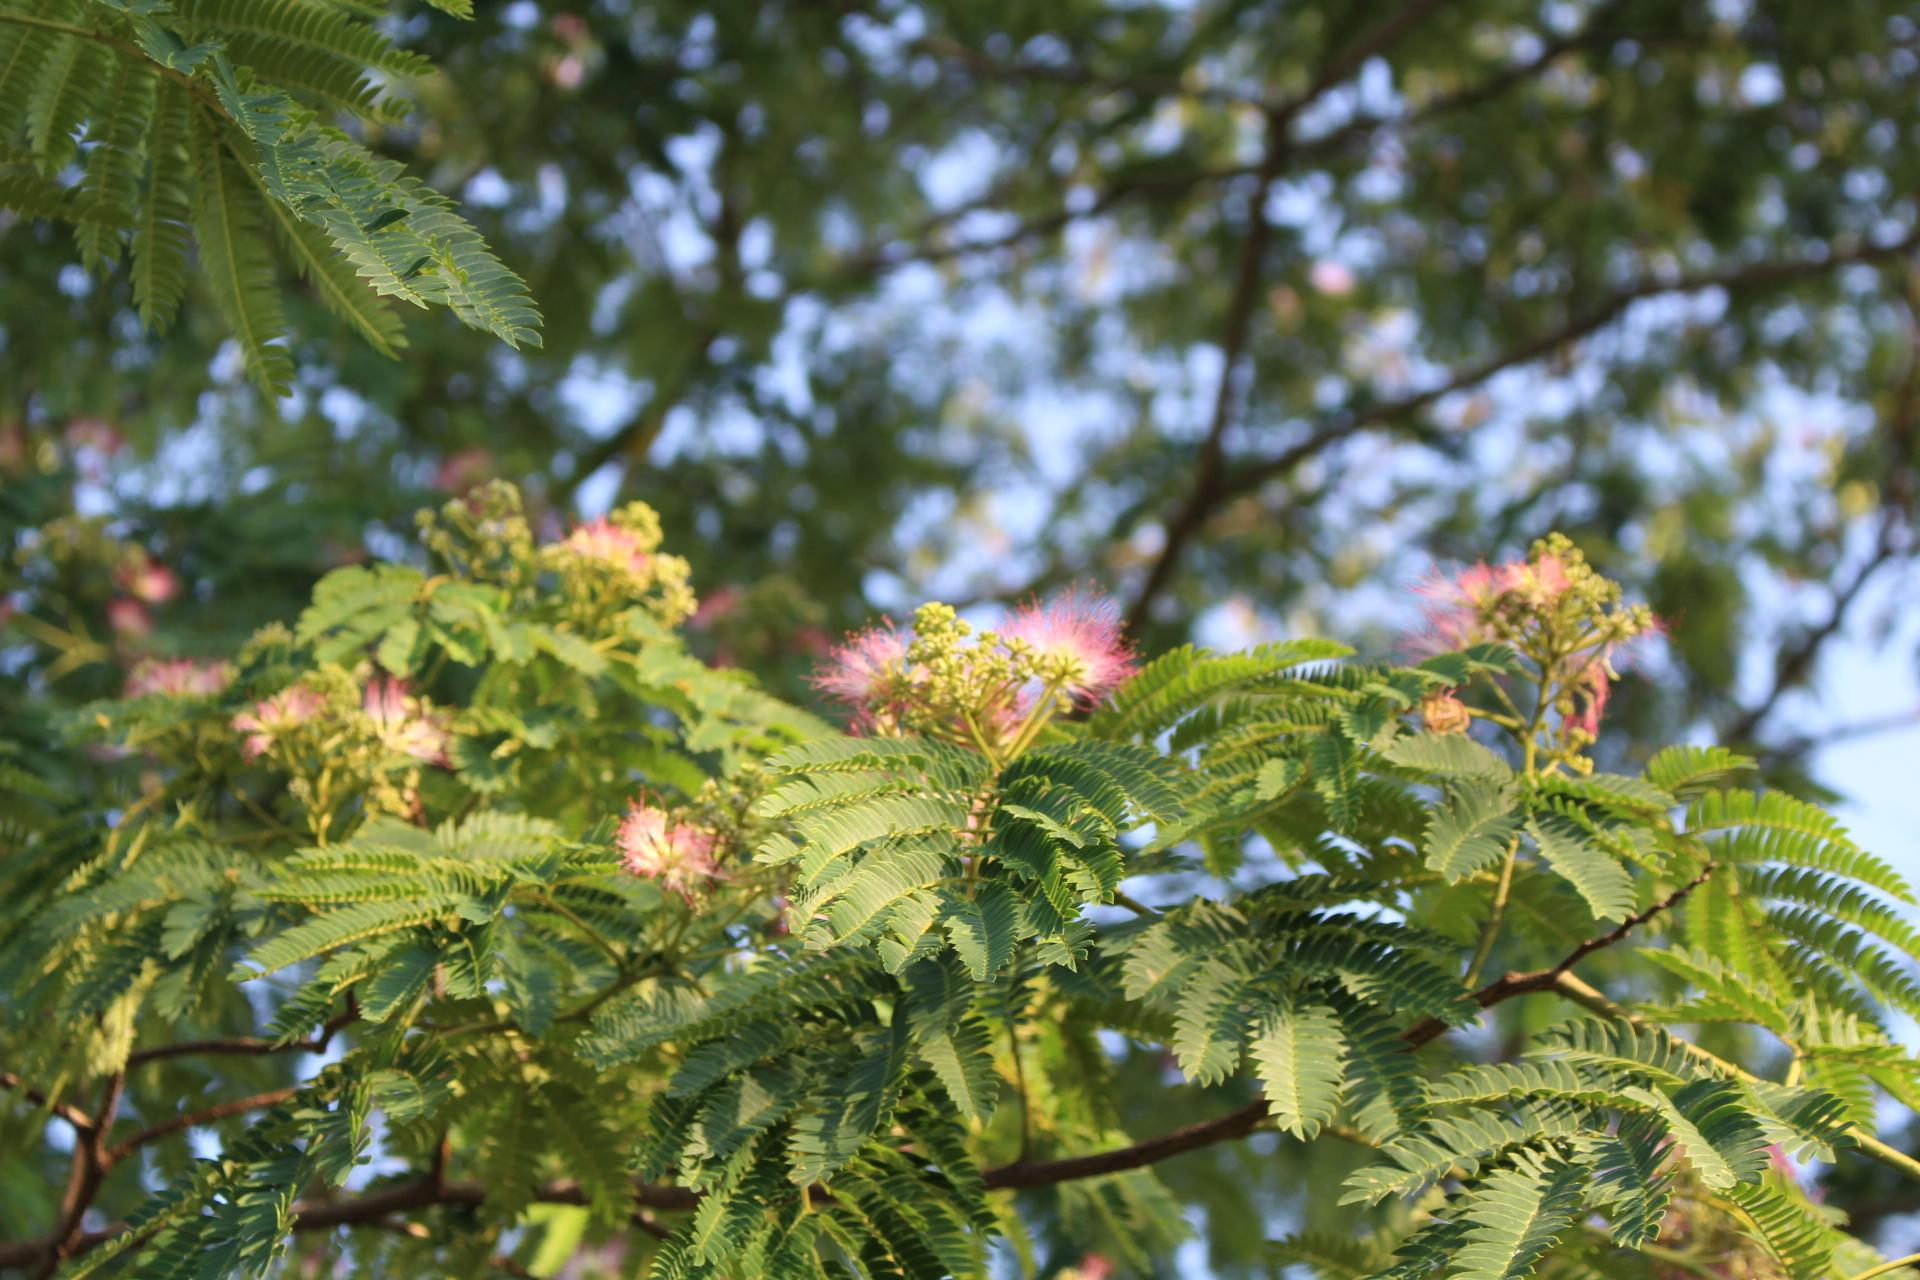 https://www.treeoflife.co.jp/garden/news/images/5d74947598a02193478976ea1cf93357594bcb8f.JPG